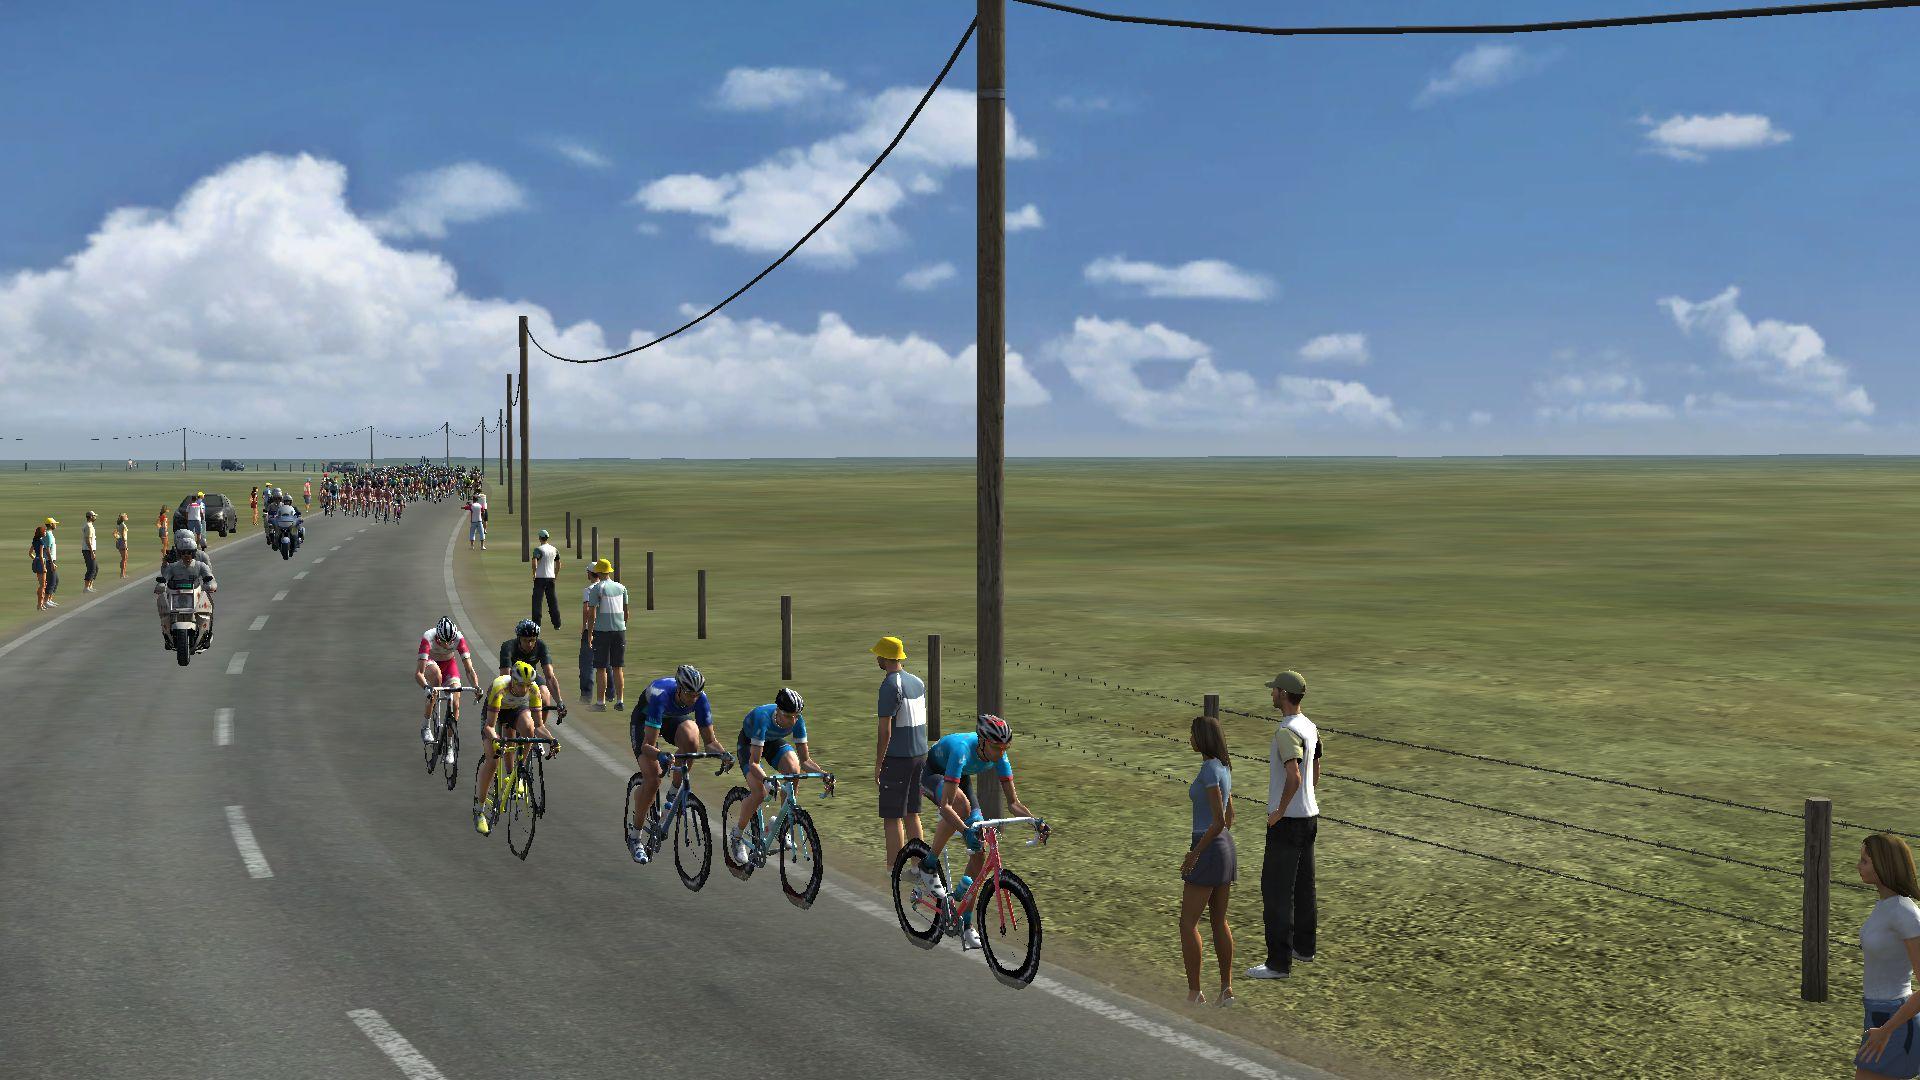 pcmdaily.com/images/mg/2019/Races/GTM/Giro/mg19_giro_10_PCM0078.jpg